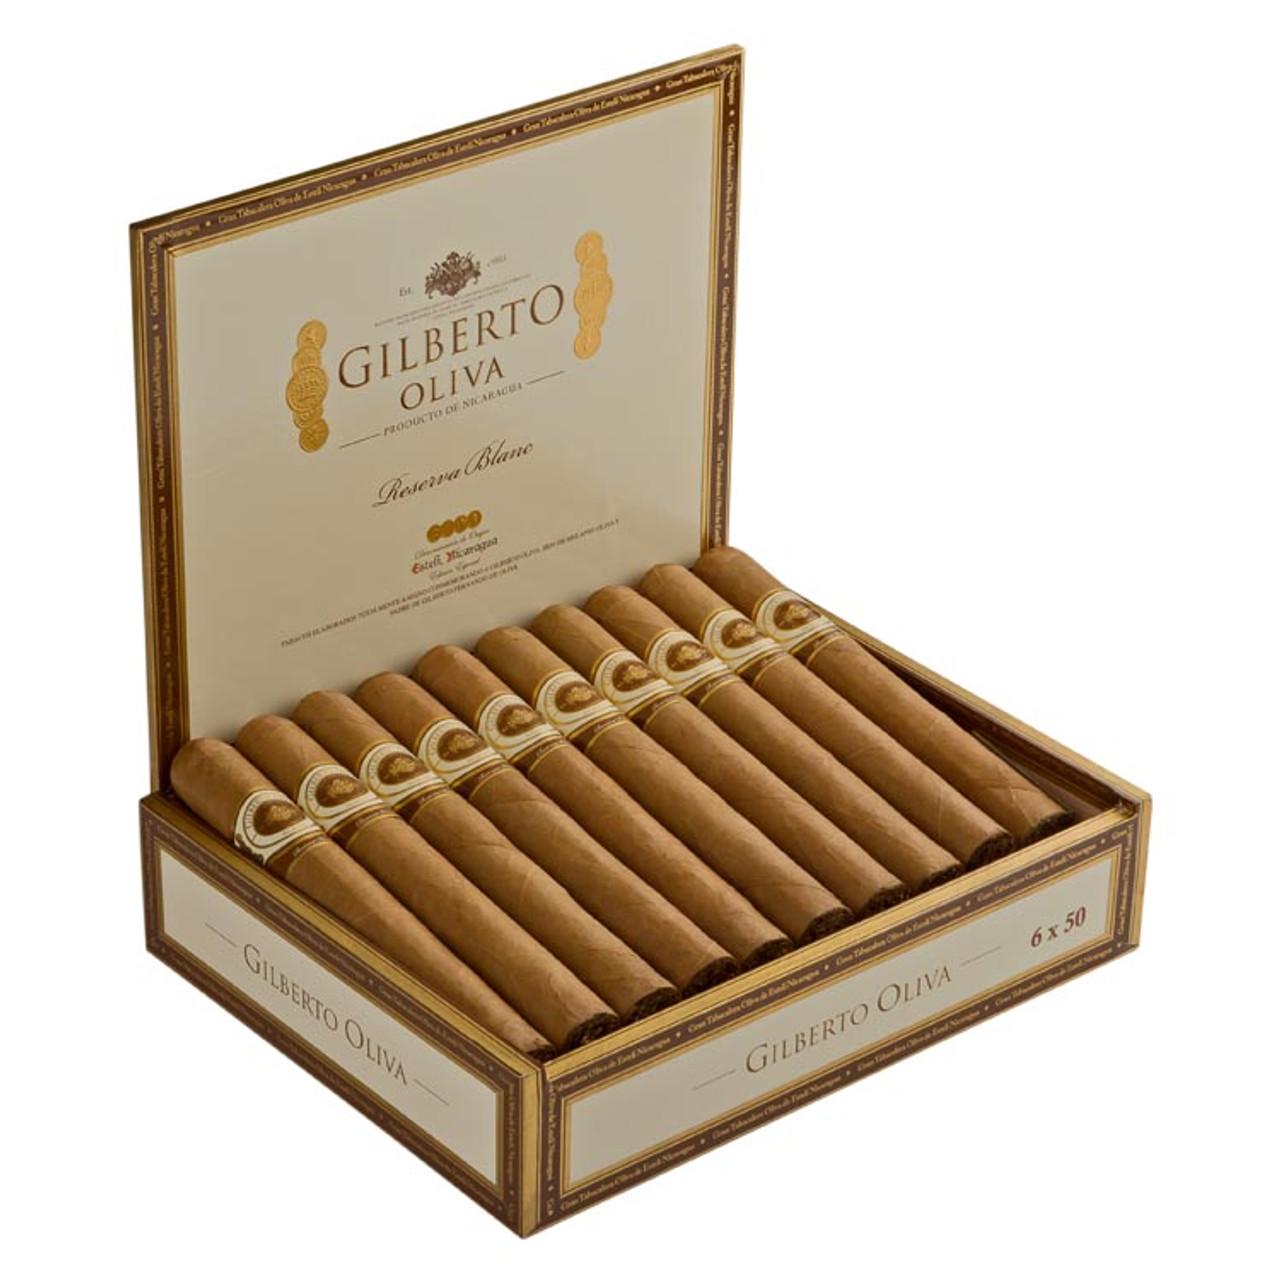 Gilberto Oliva Reserva Blanc Corona Cigars - 5.75 x 43 (Box of 20)